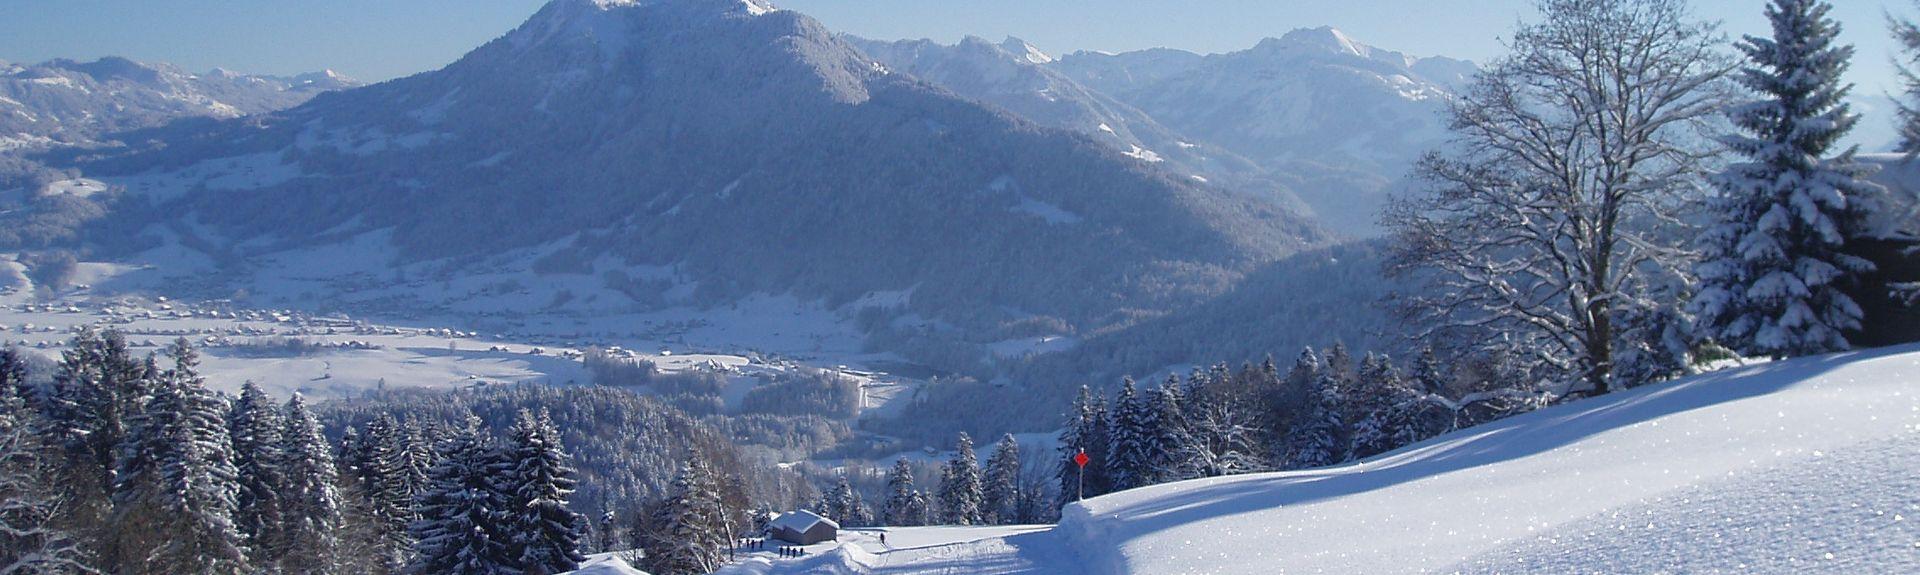 Oberdamuels Ski Lift, Damüls, Vorarlberg, Austria